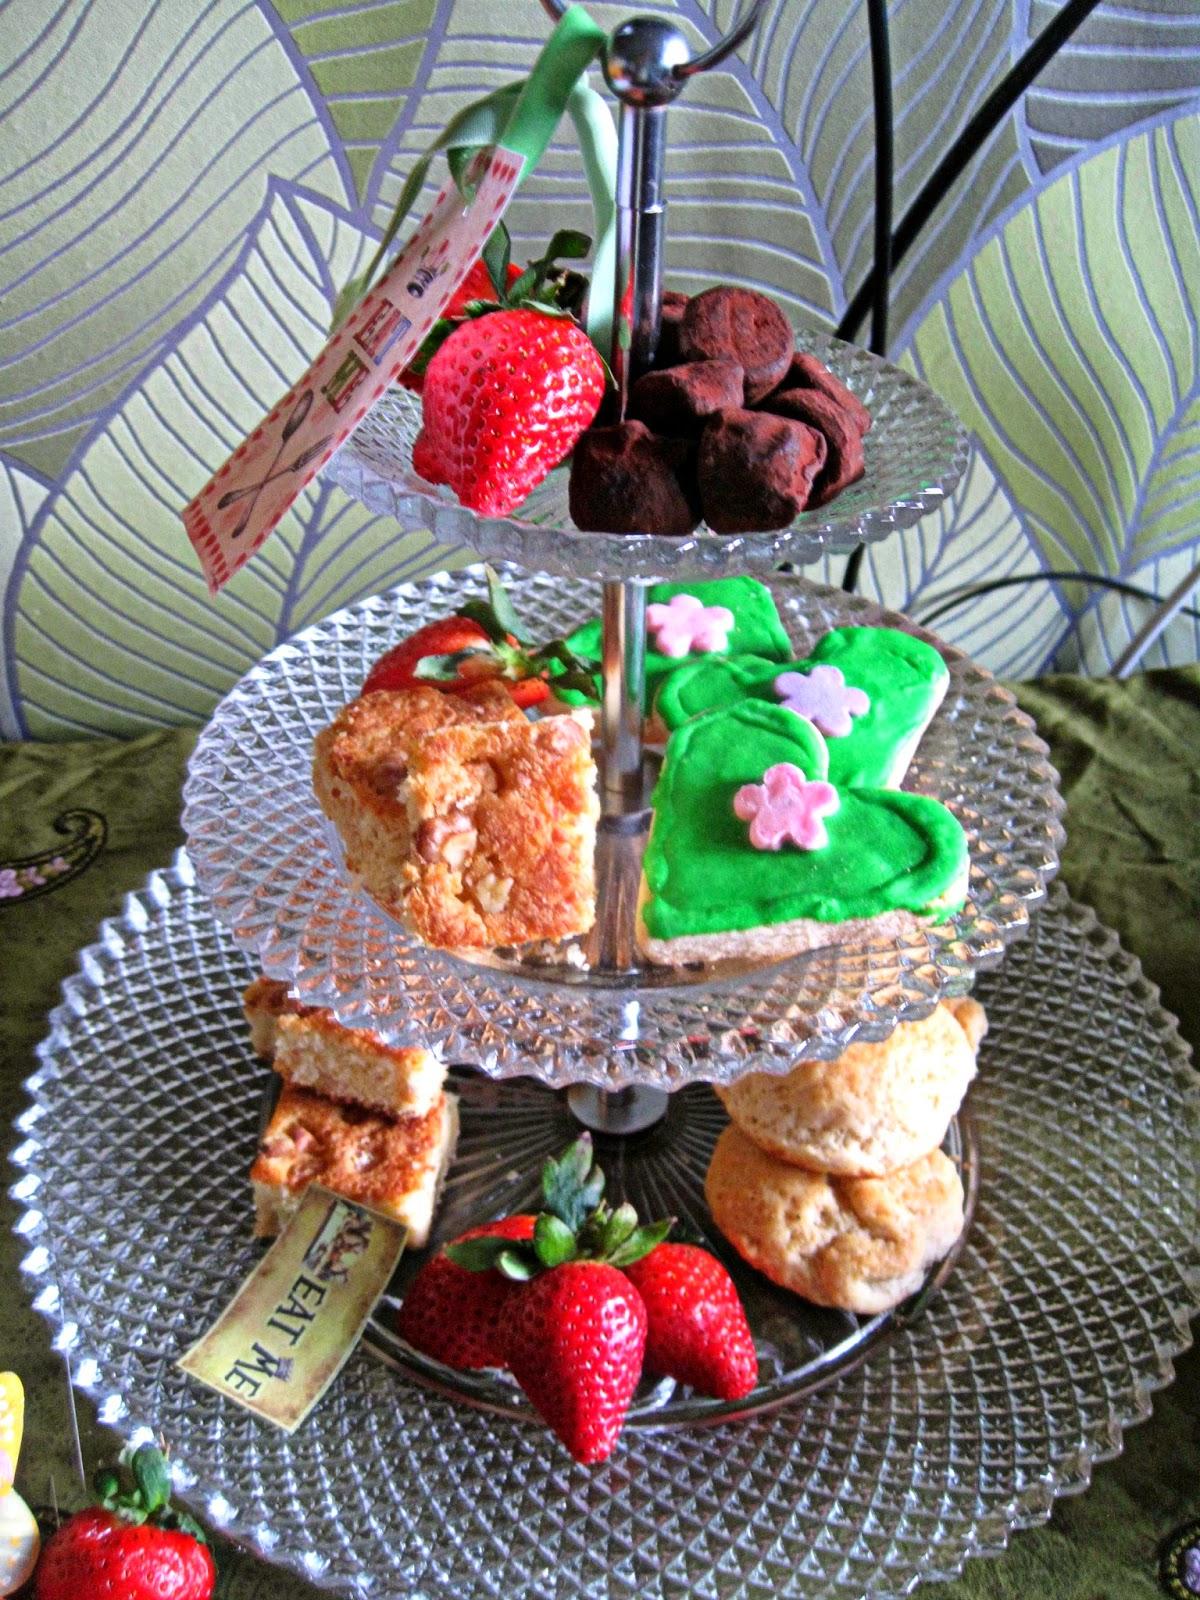 http://cupcakeluvs.blogspot.dk/2014/04/alice-in-wonderland-tea-party-kylling.html